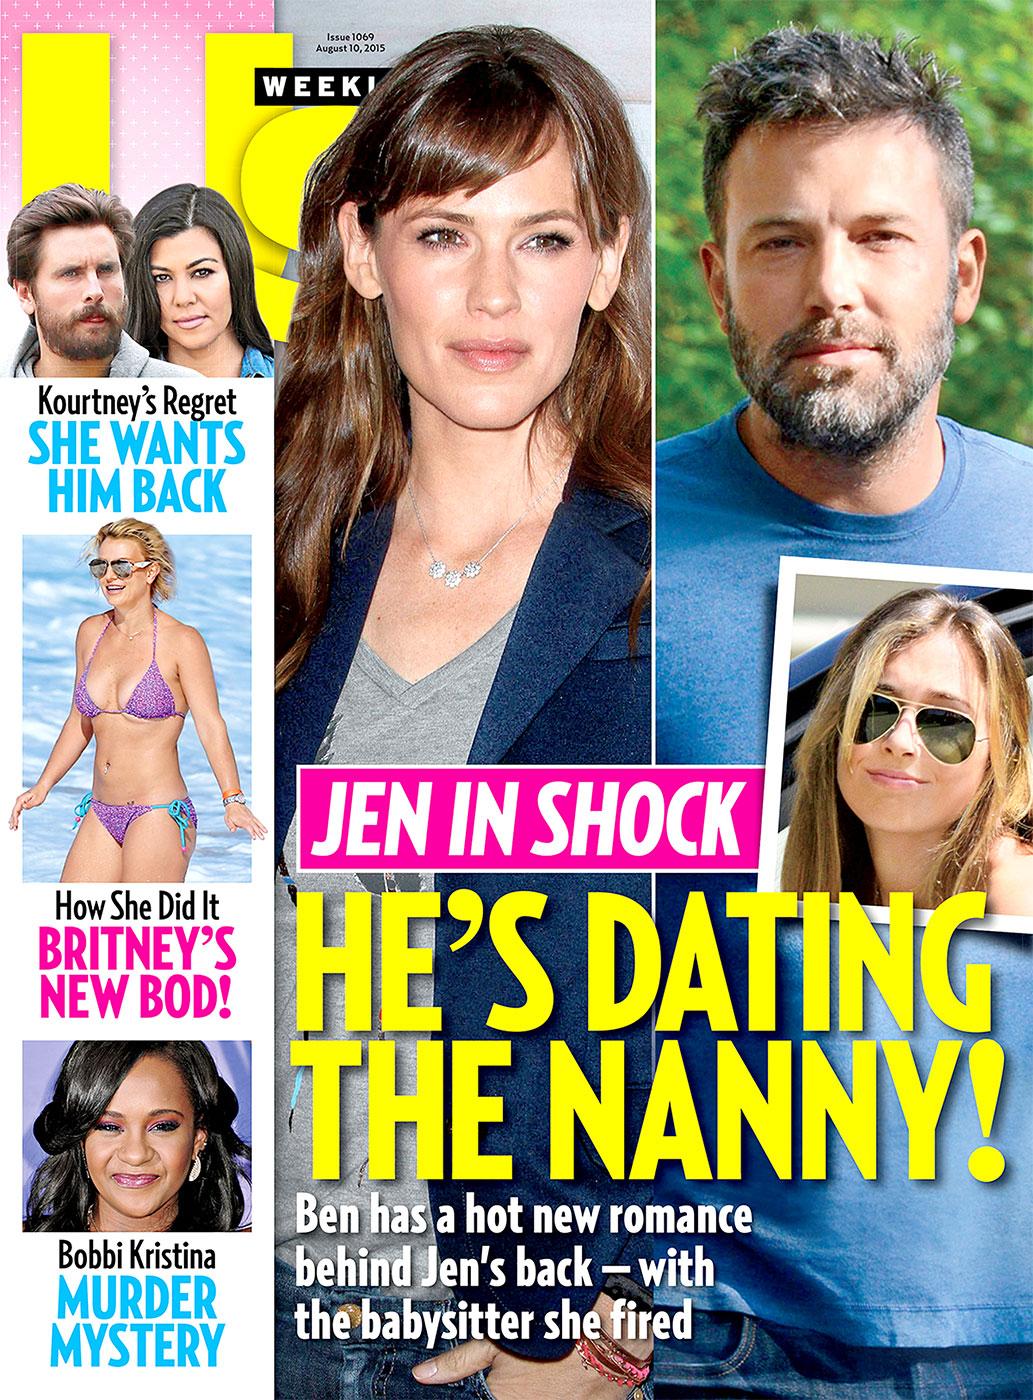 Is ben affleck dating nanny